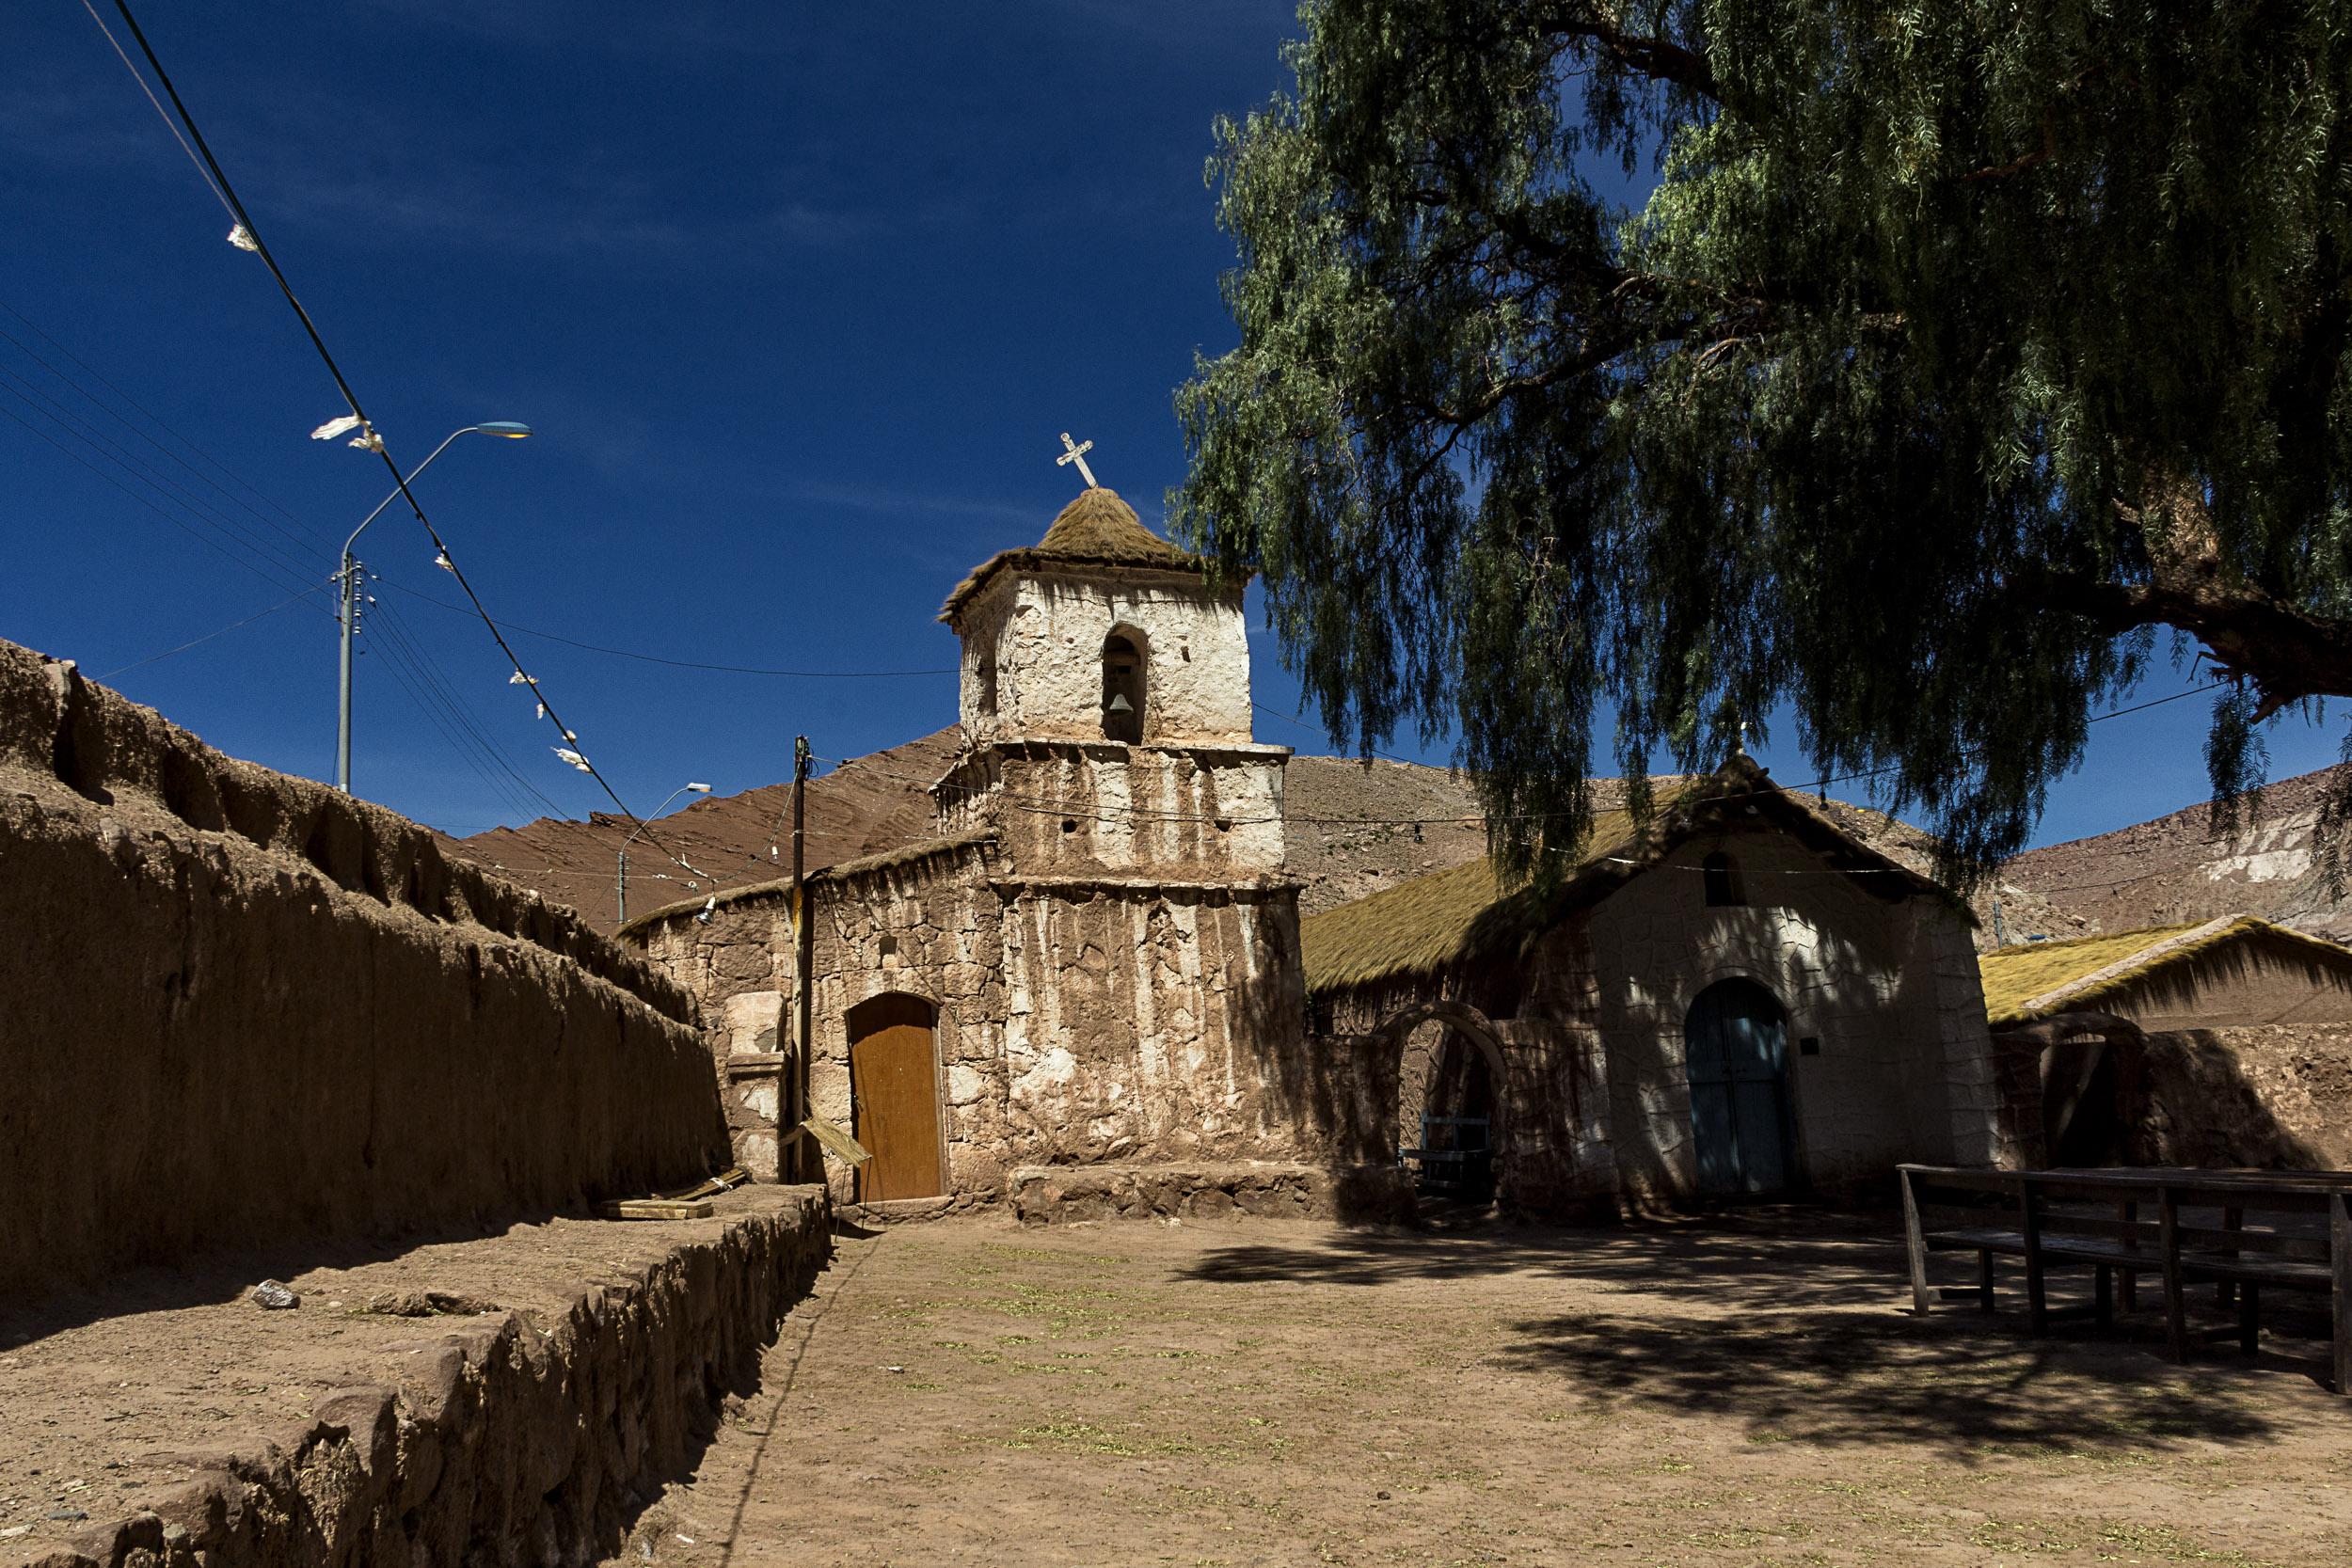 Rio Grande, Norte de Chile